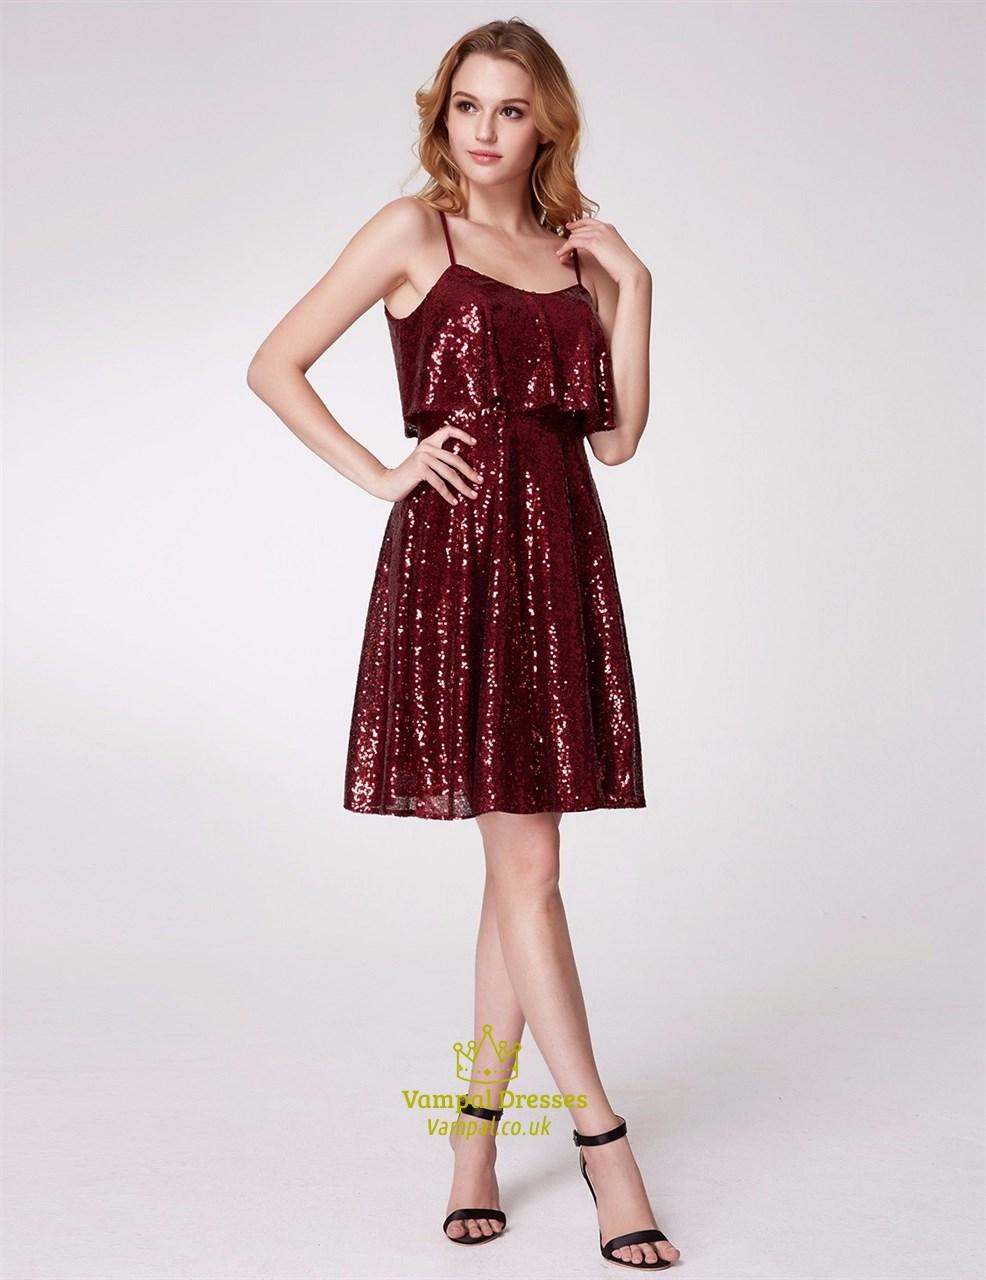 b2c70a93ddc A Line Burgundy Spaghetti Strap Sequin Short Prom Dress With Ruffle SKU  -C624